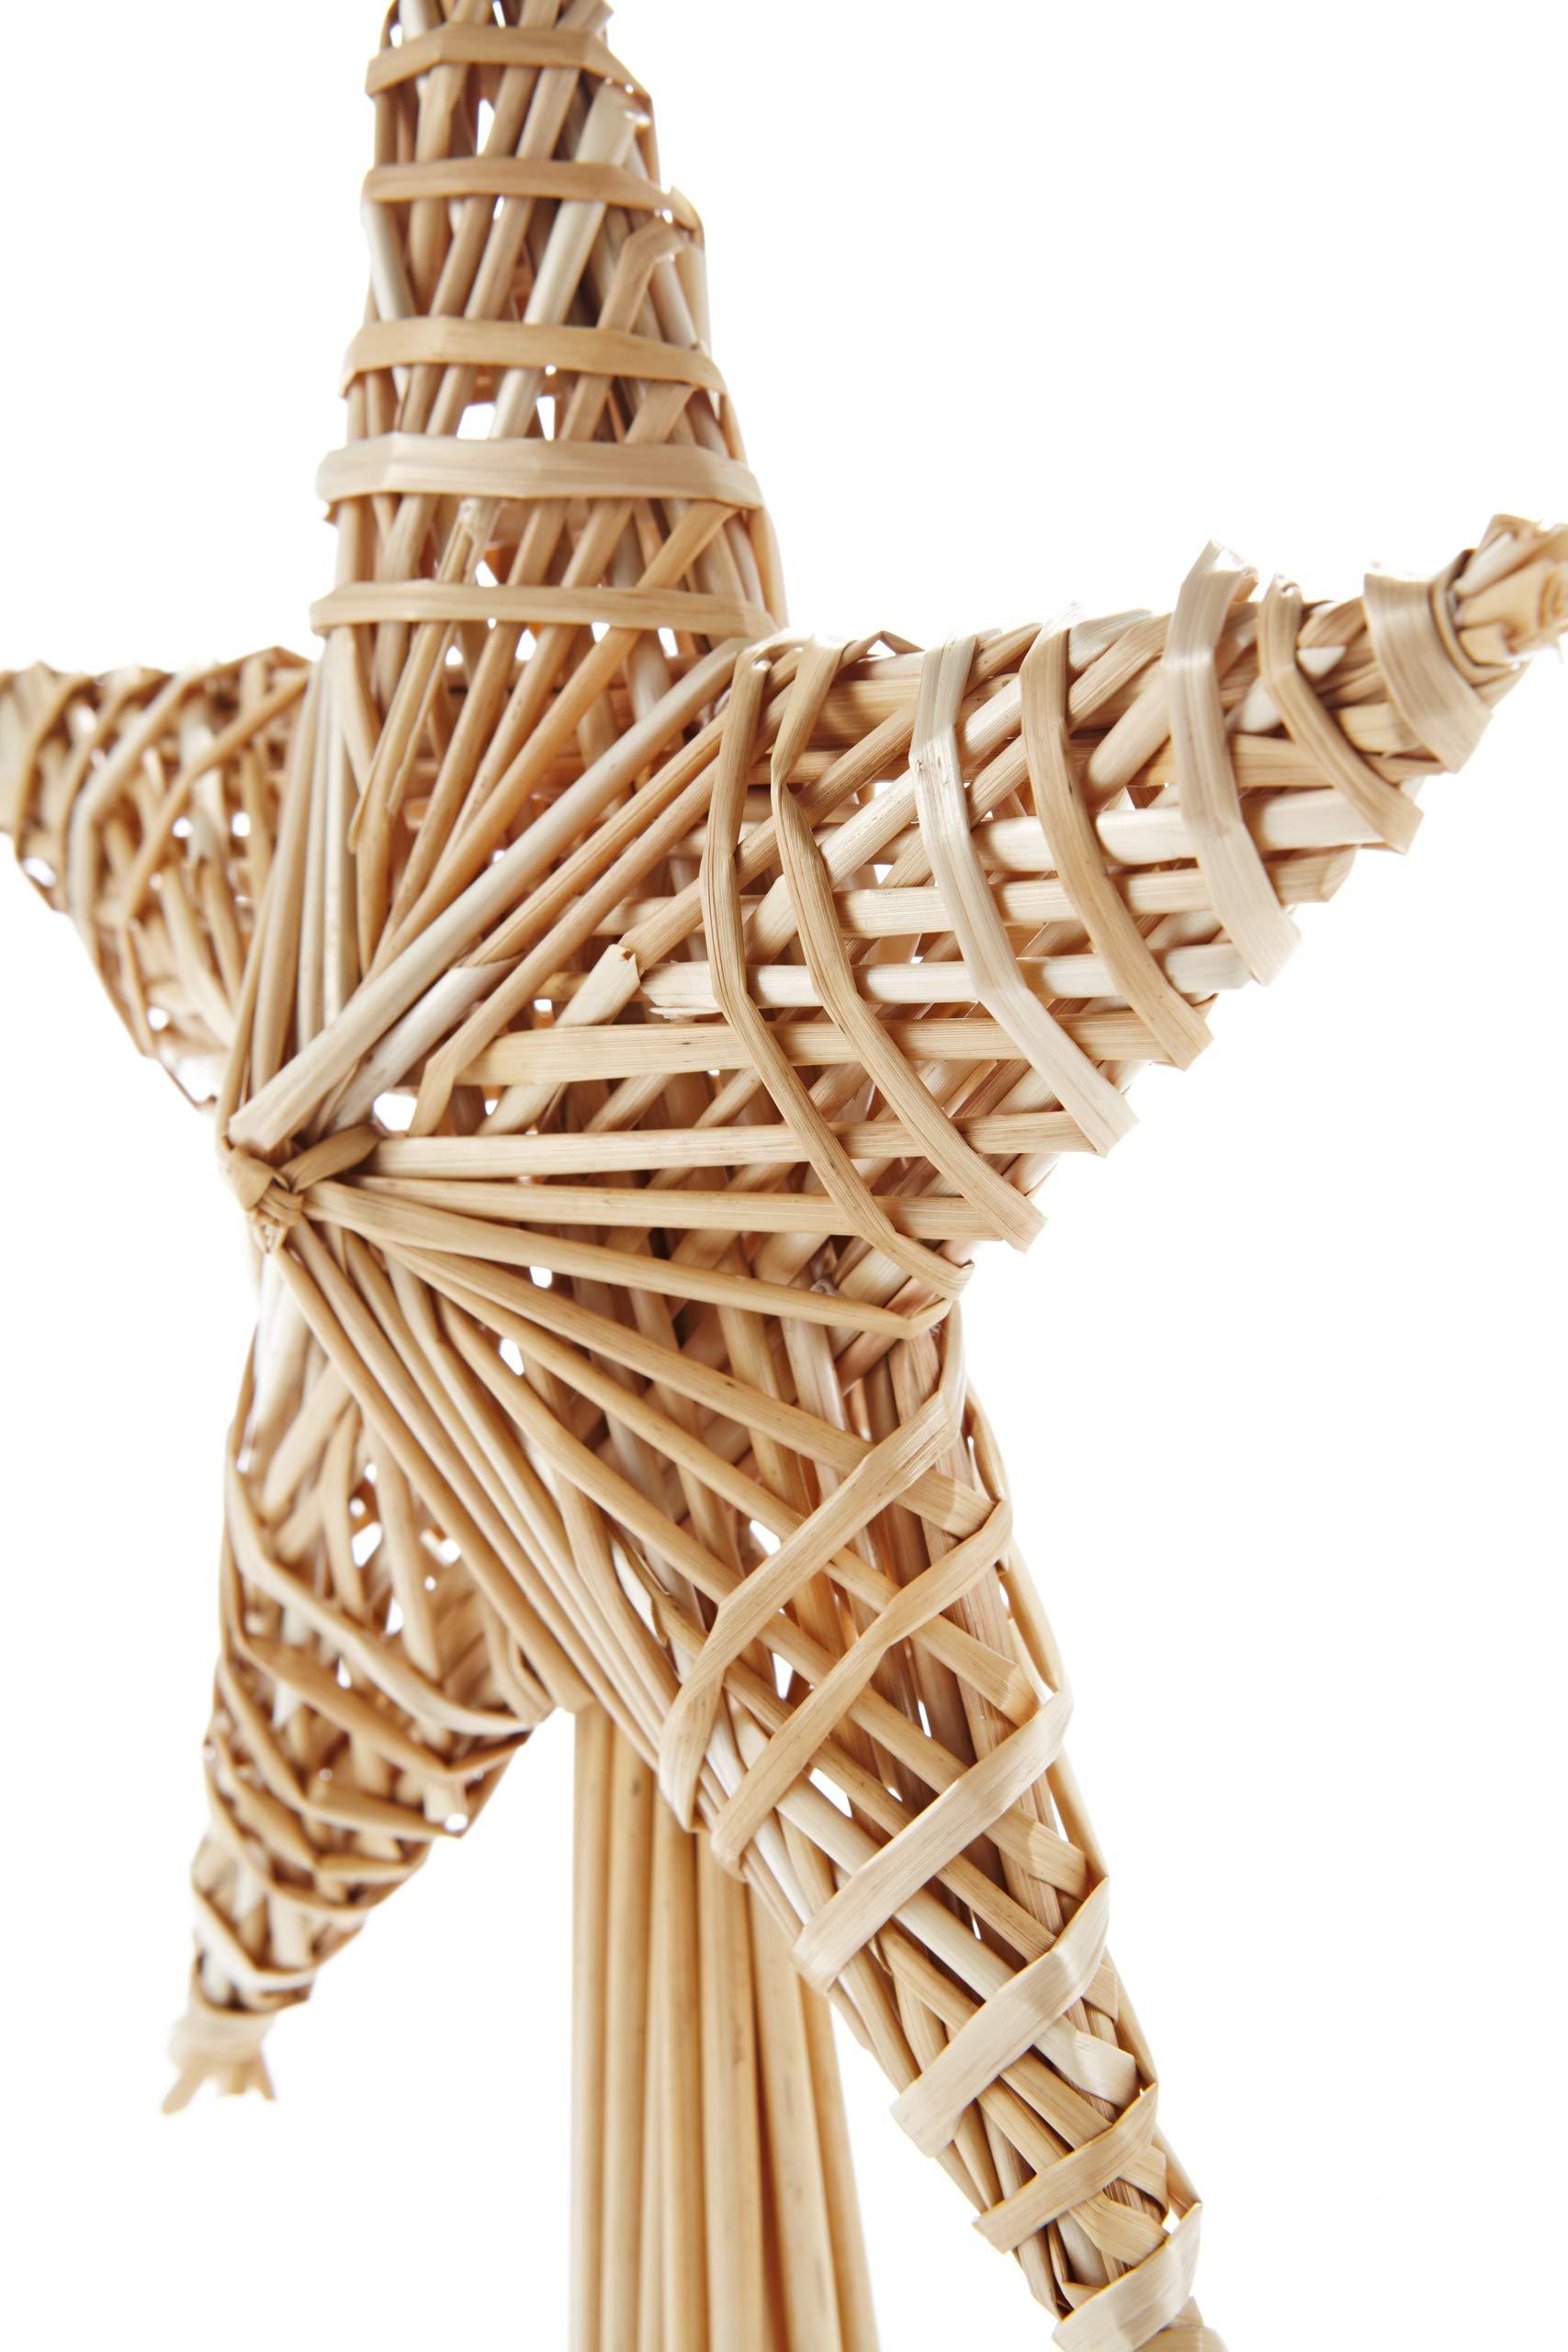 HEITMANN-DECO-Stroh-Baumspitze-25-cm-Natur-Christbaumspitze-Stern-aus-Stroh-Christbaumschmuck-aus-natrlichem-Material